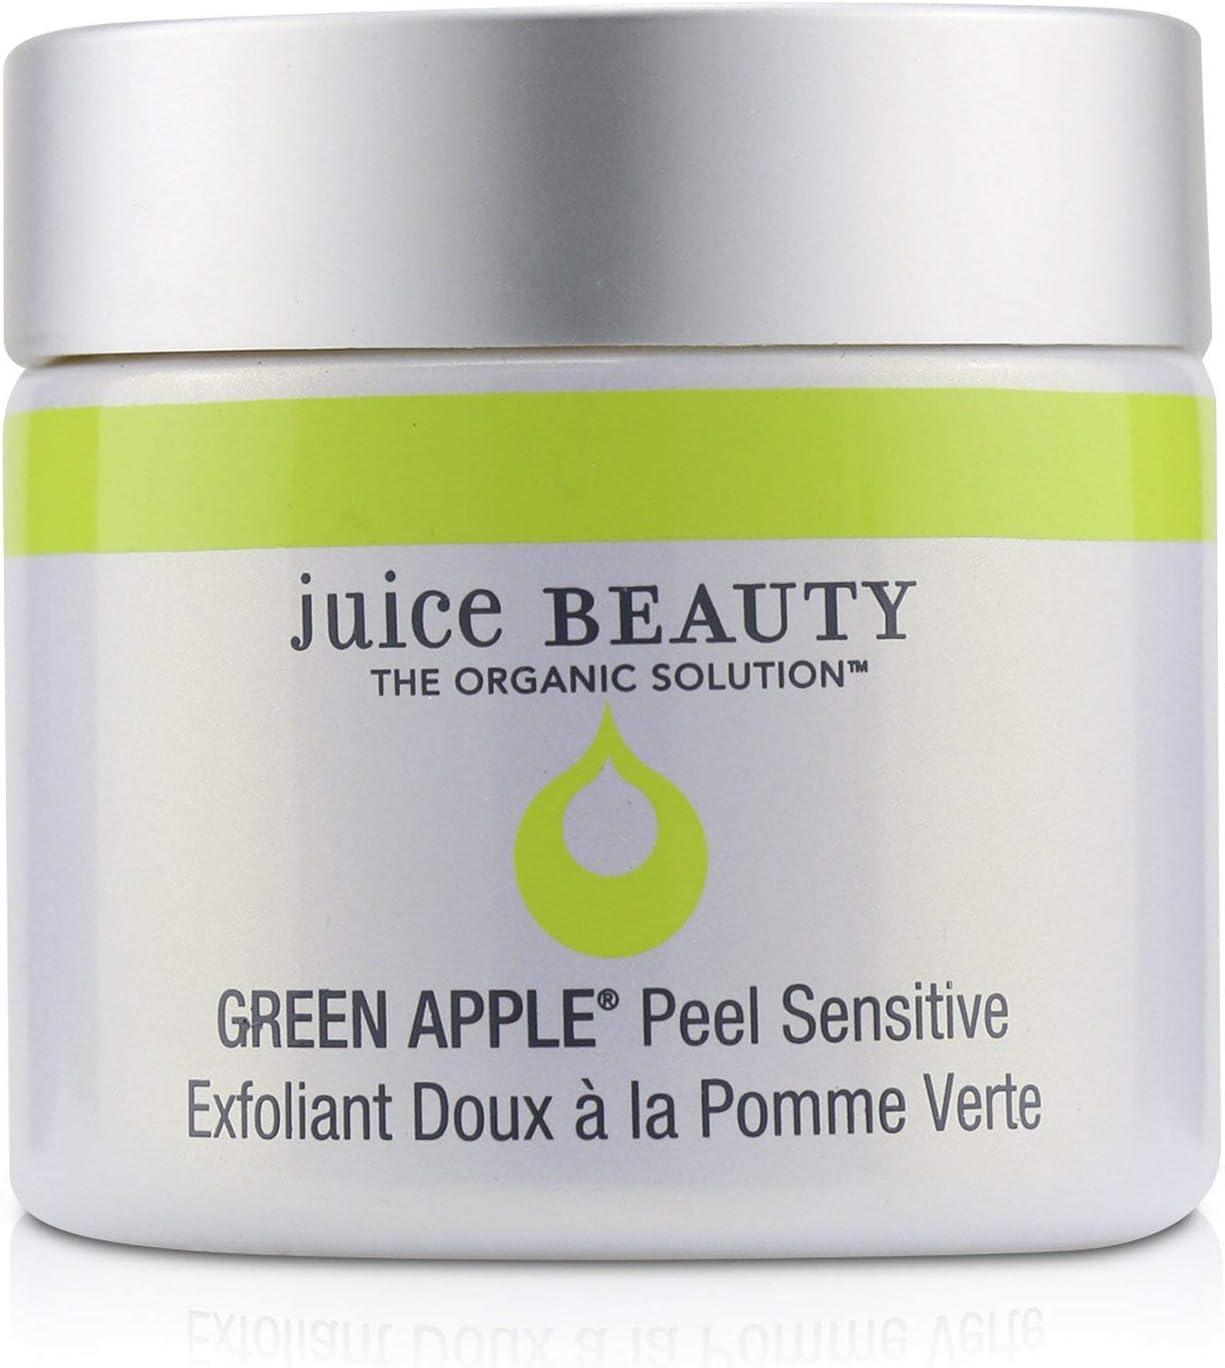 Juice Beauty Green Apple Peel Sensitive Exfoliating Mask 60ml